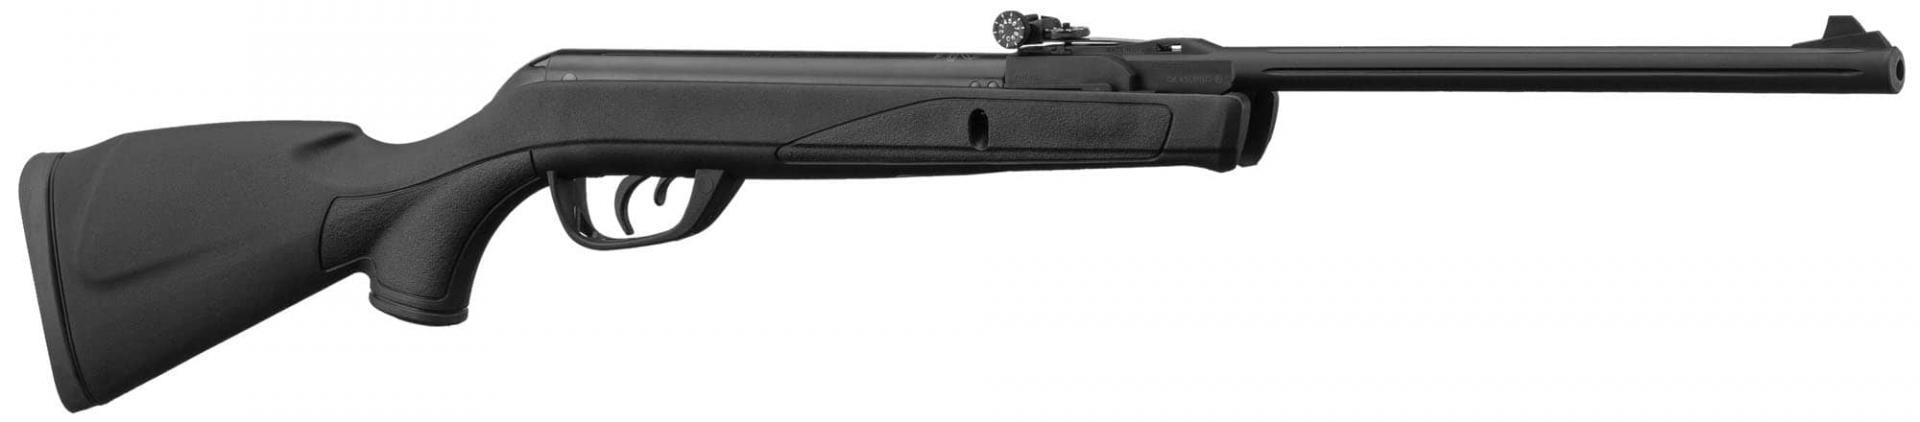 Ca1135 3